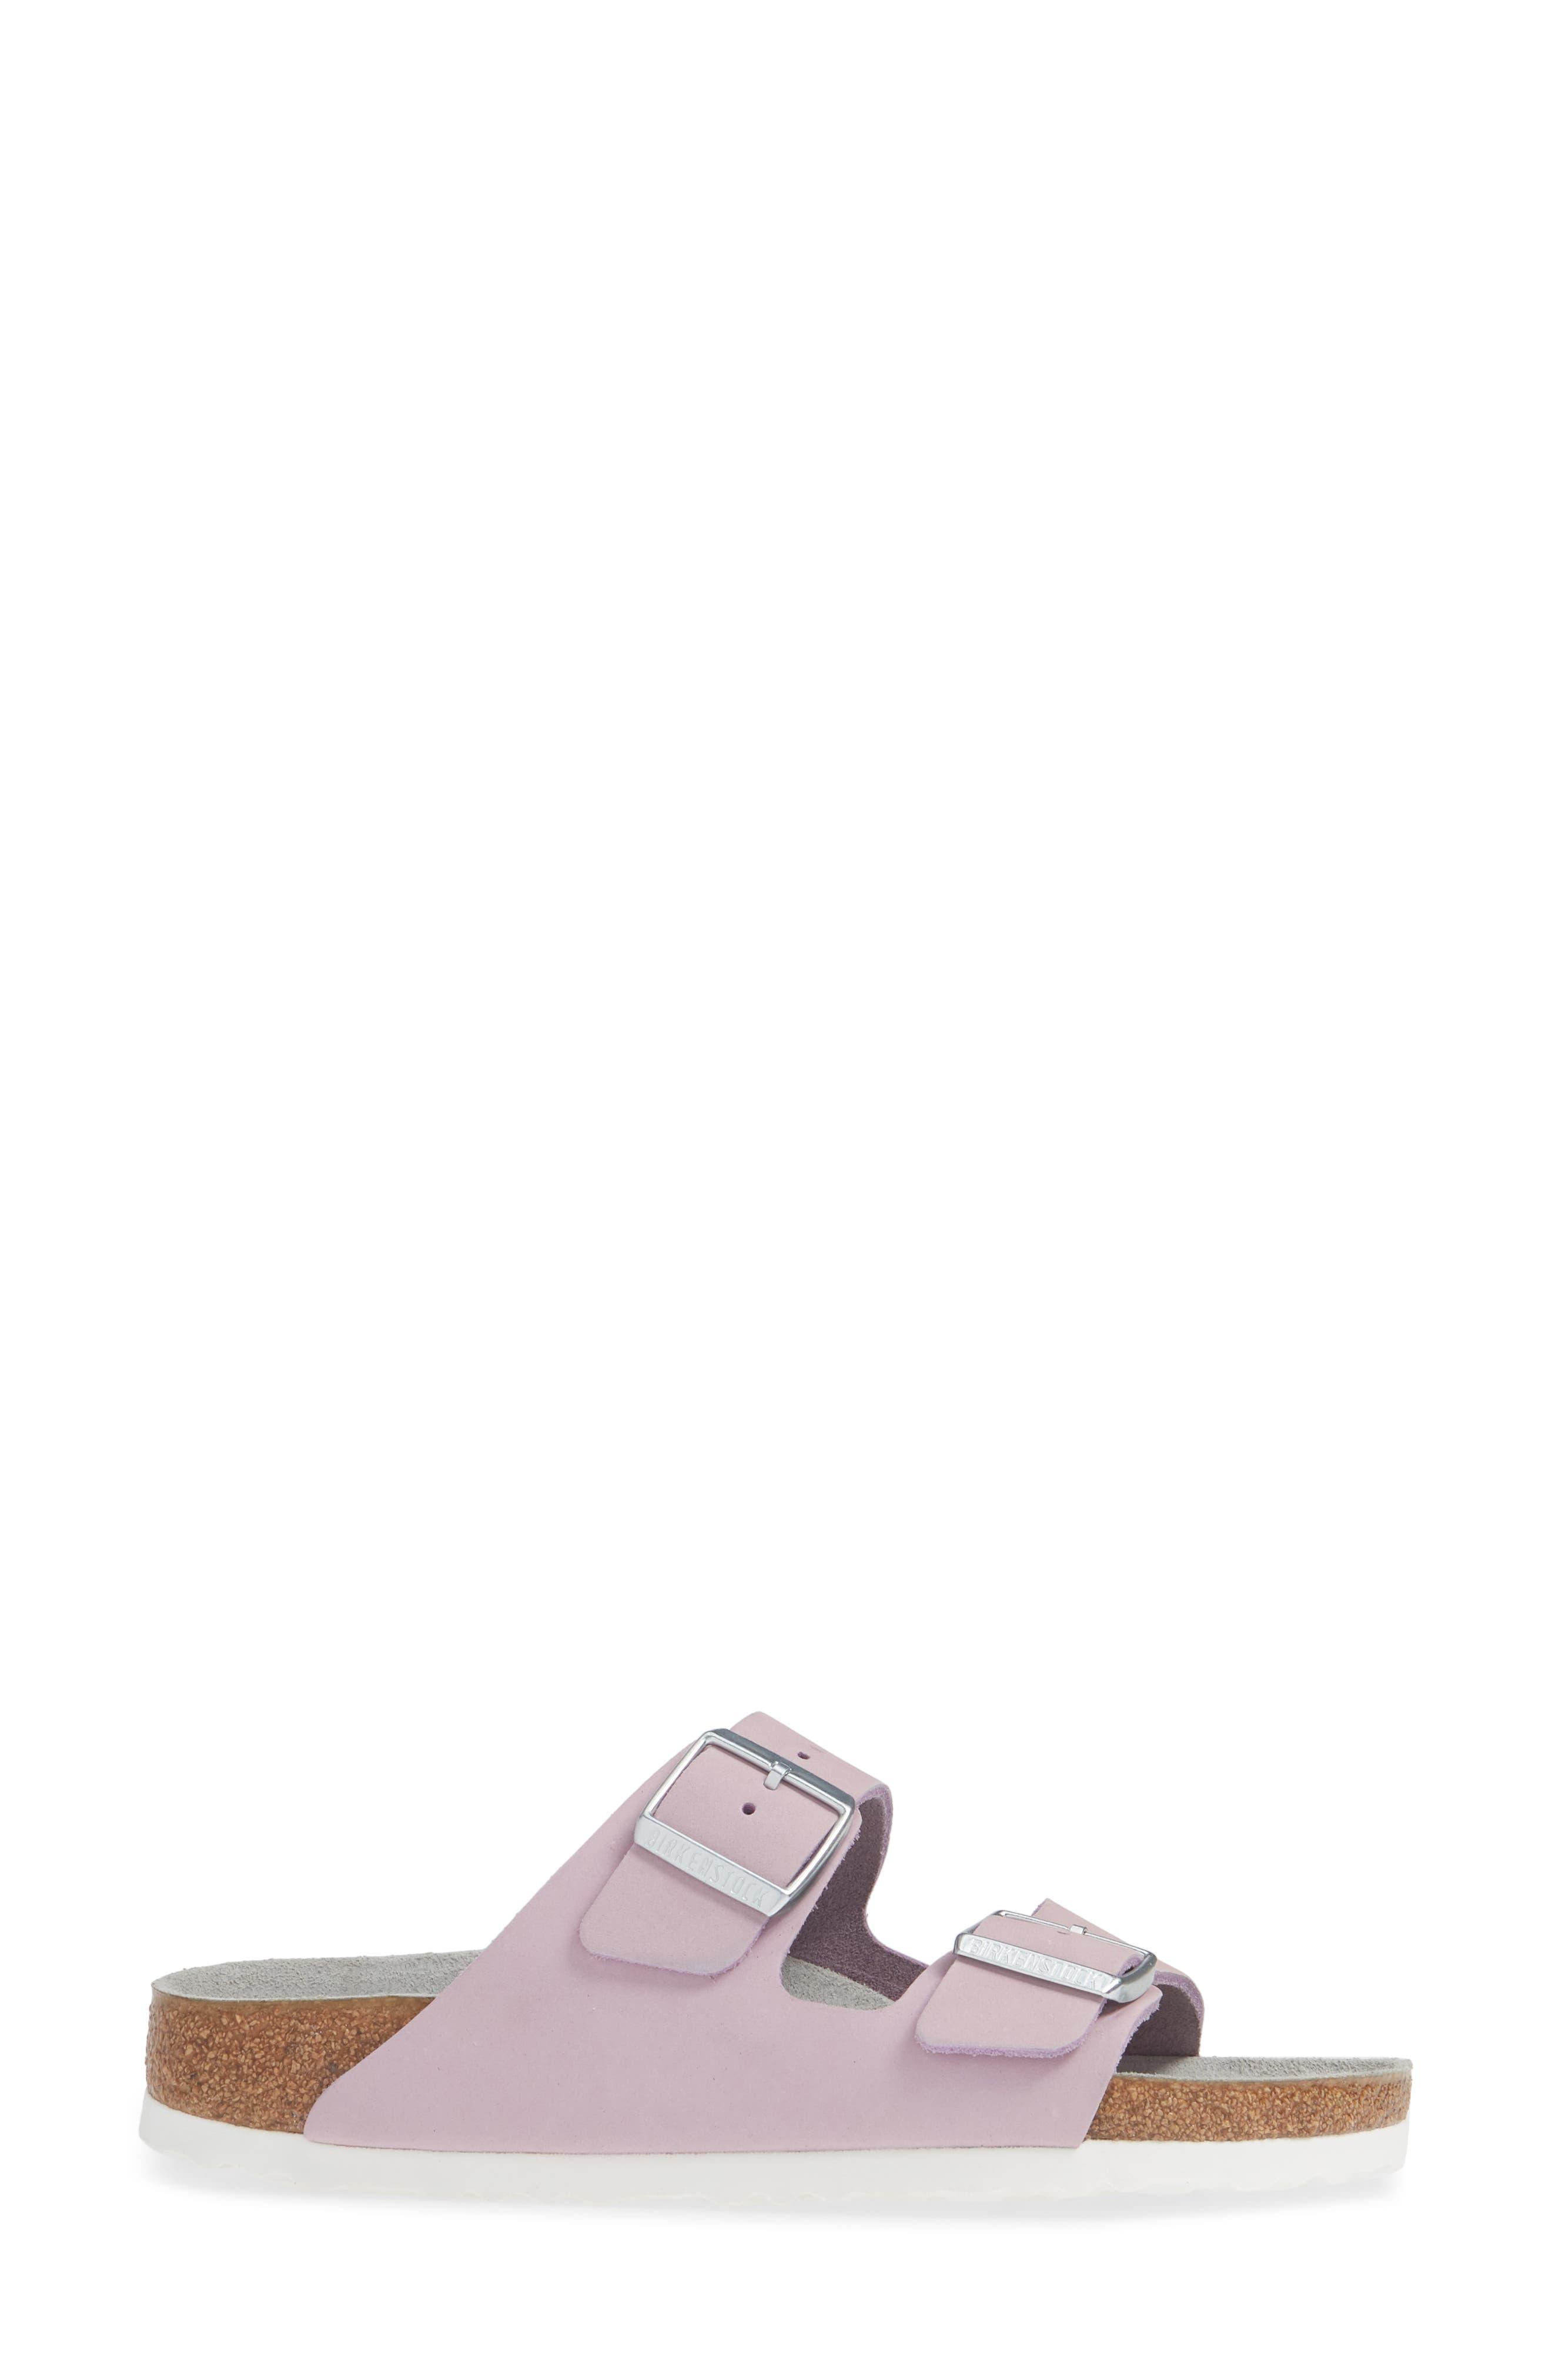 BIRKENSTOCK, Arizona Soft Footbed Sandal, Alternate thumbnail 3, color, LILAC NUBUCK